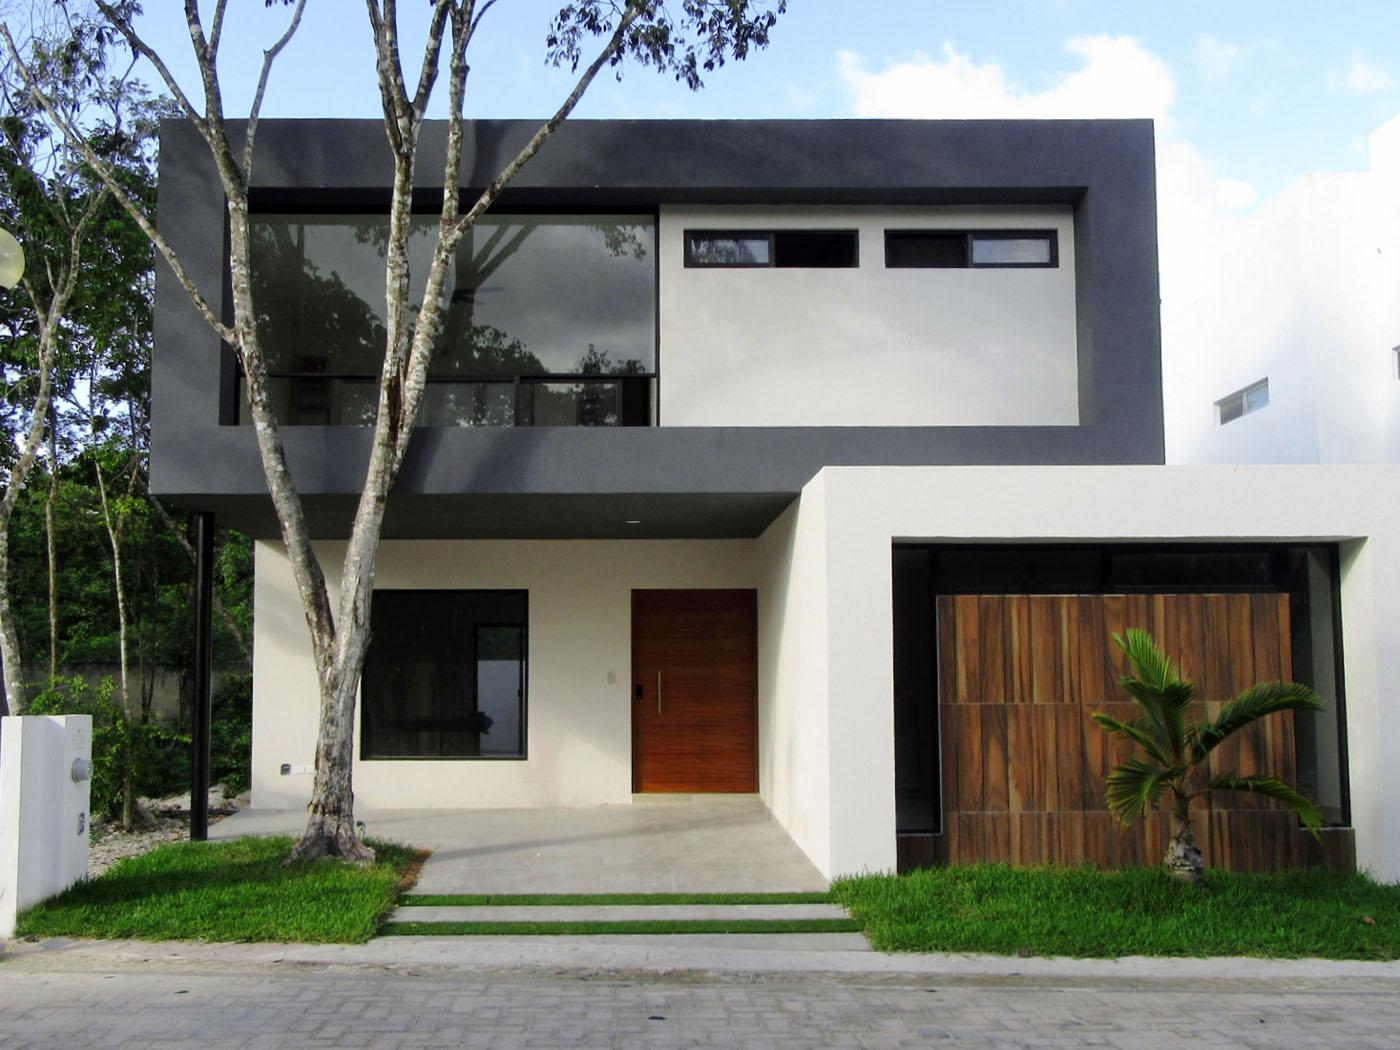 foto fachada de casa de dos pisos moderna minimalista